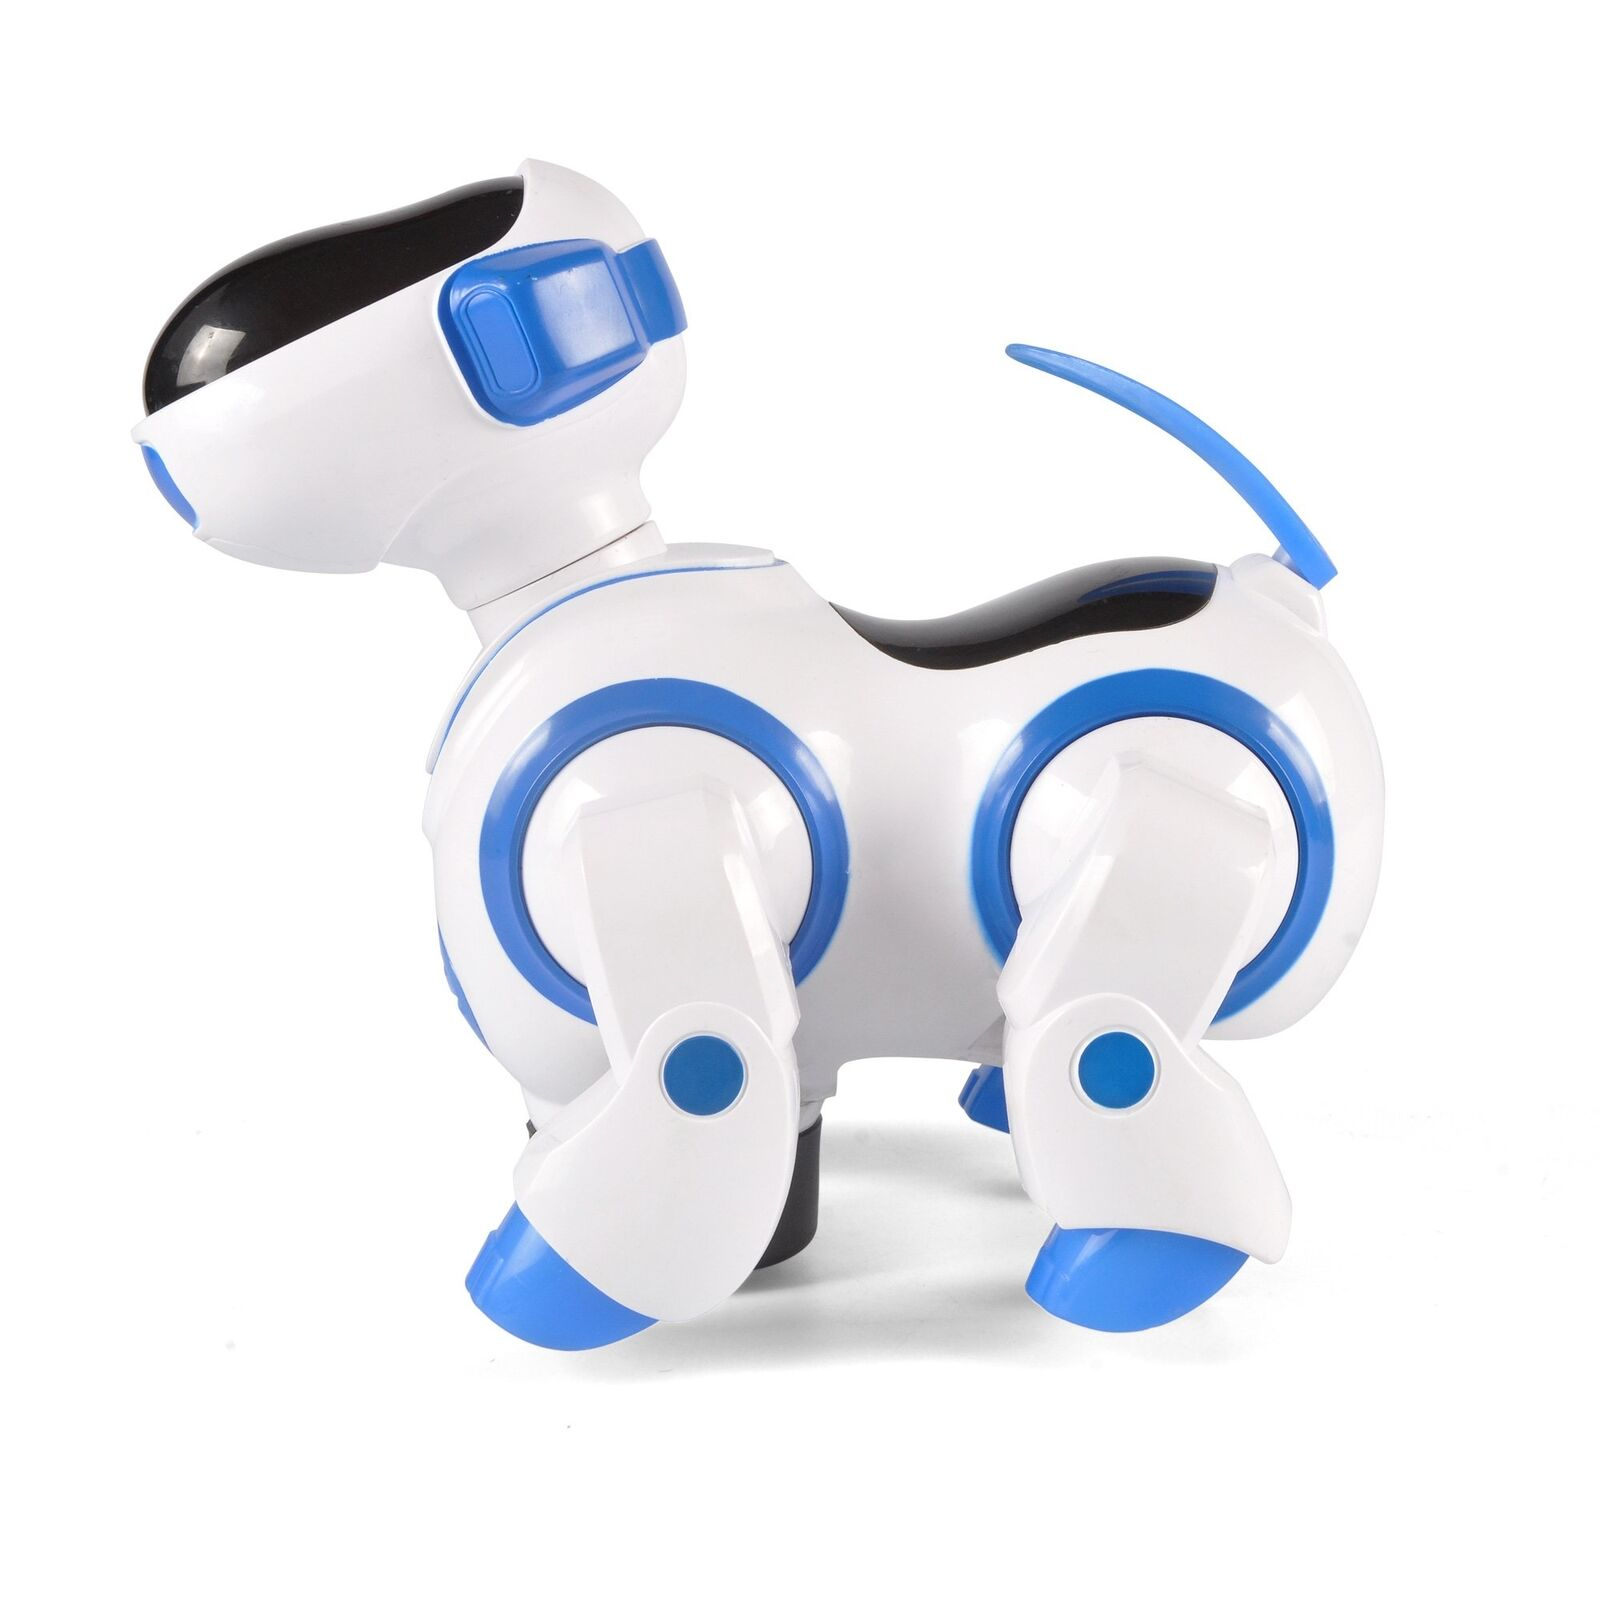 Toys for Boys Toy Kids Walking Dancing Robot Dog 6 7 8 9 10